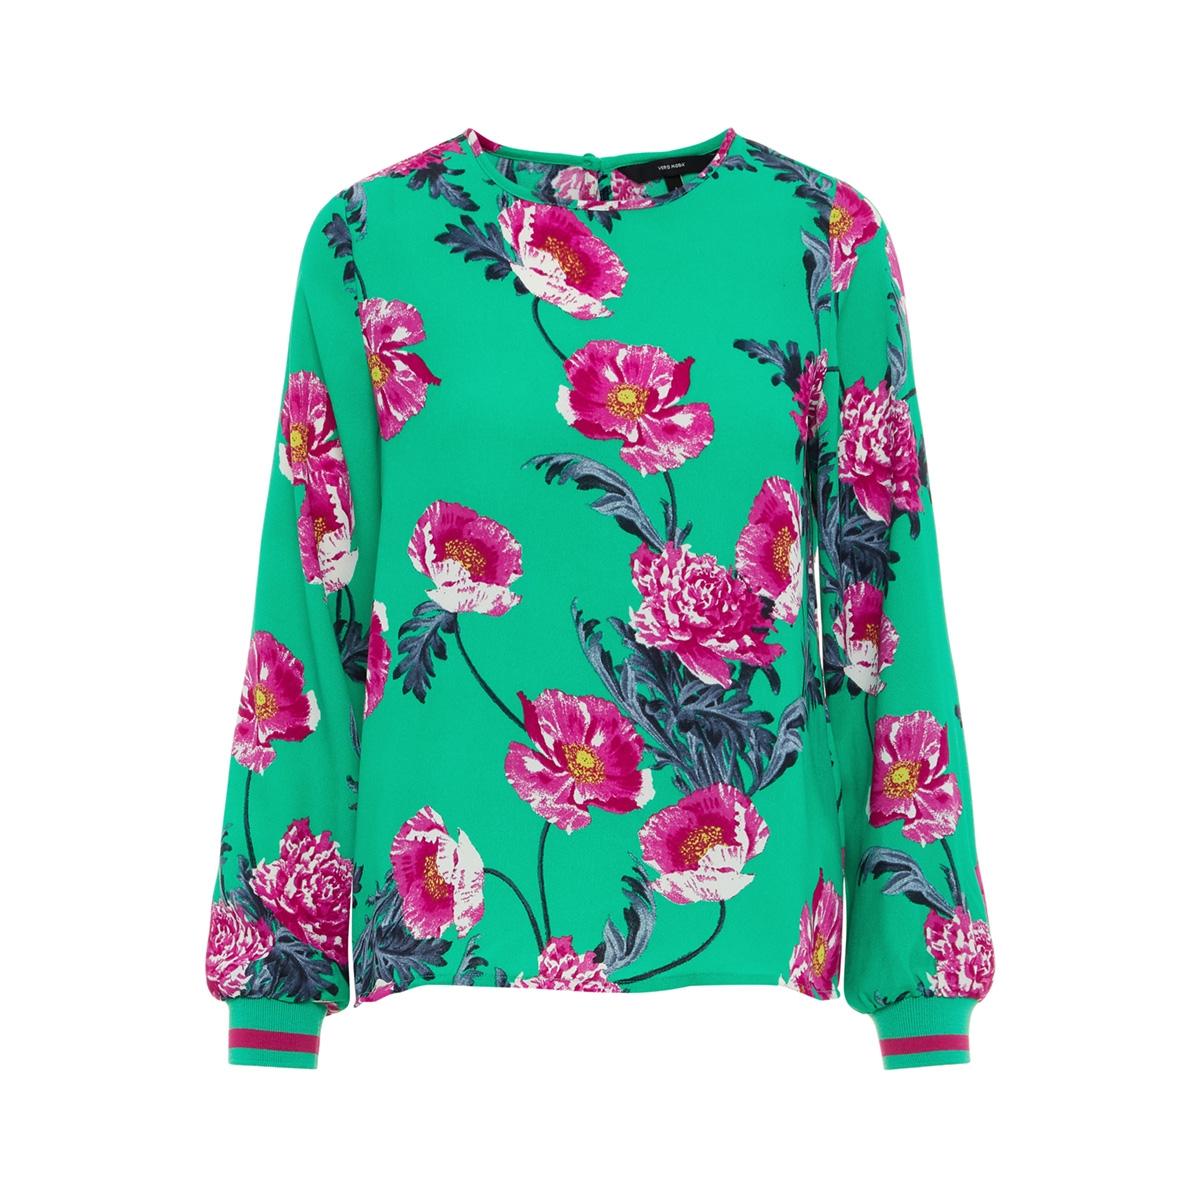 vmholly l/s midi top d2-1 wvn 10210142 vero moda blouse holly green